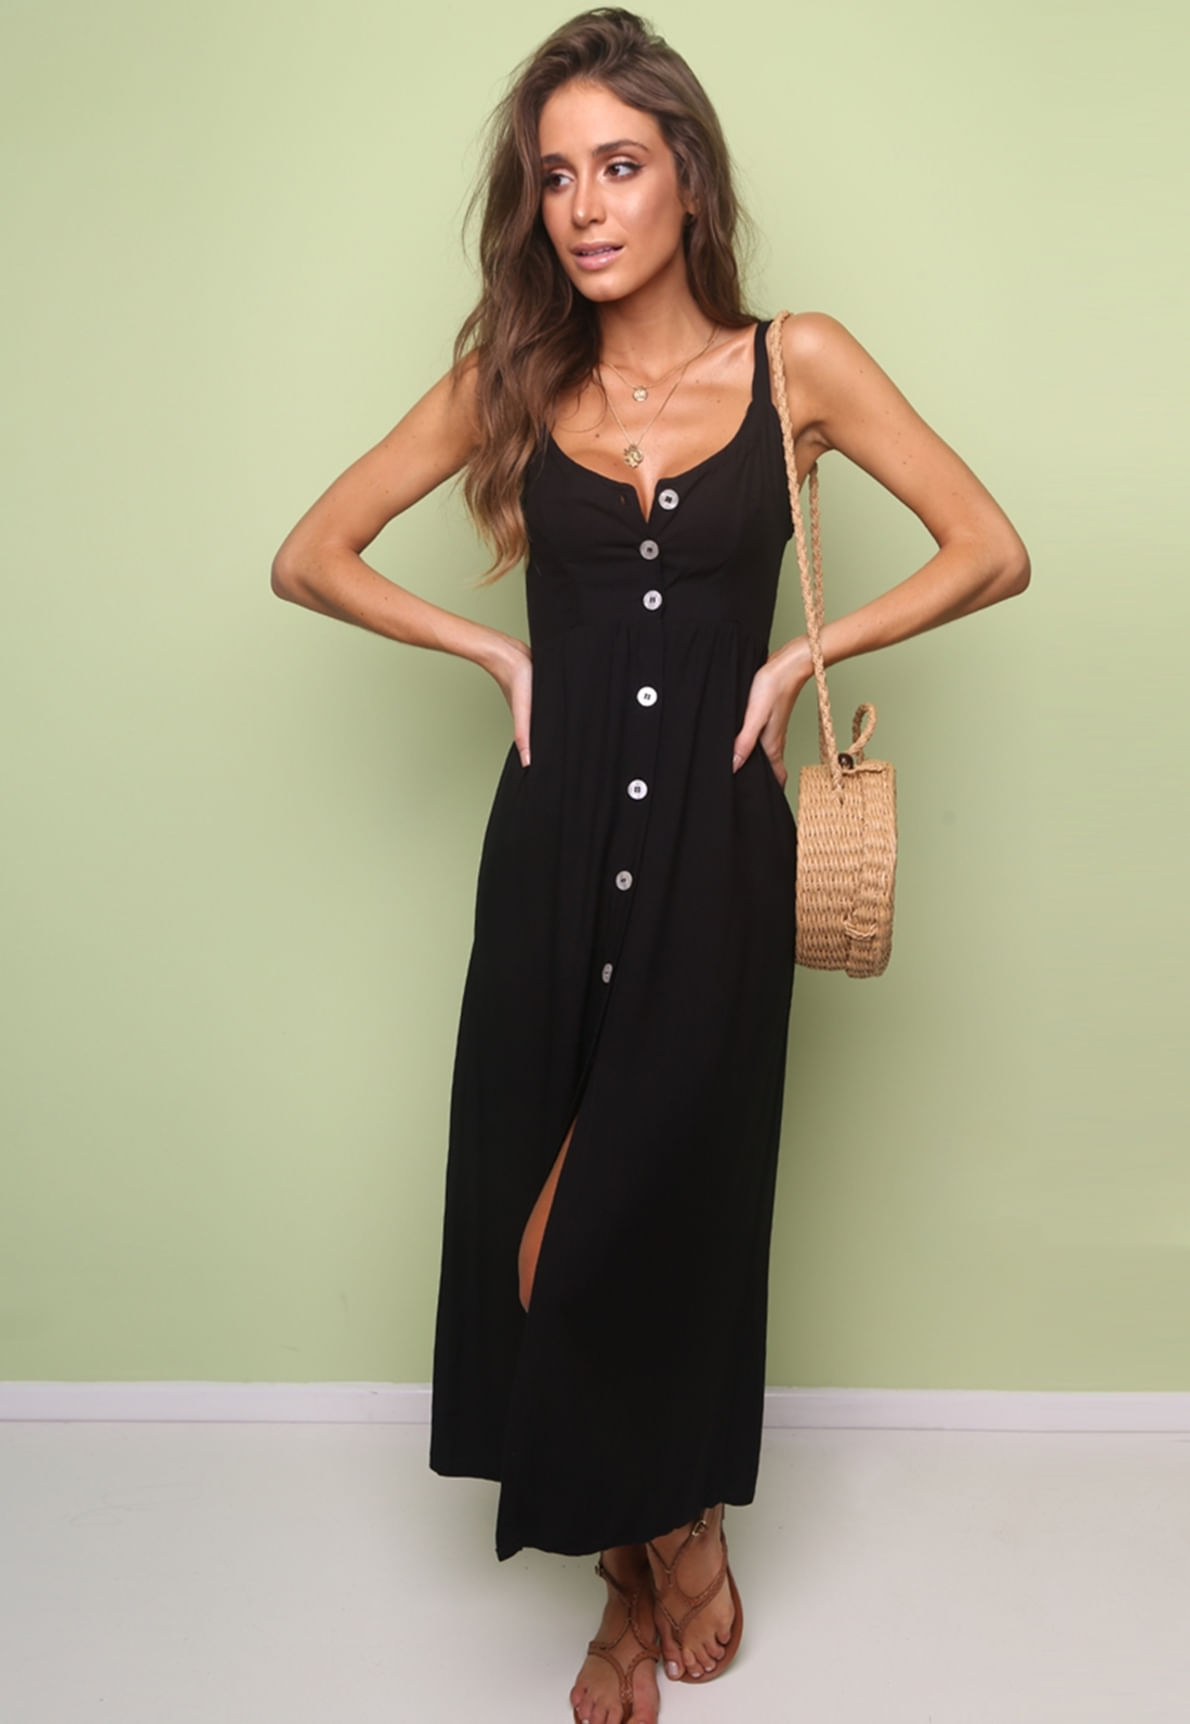 30965-vestido-longo-botoes-preto-amber-mundo-lolita-02